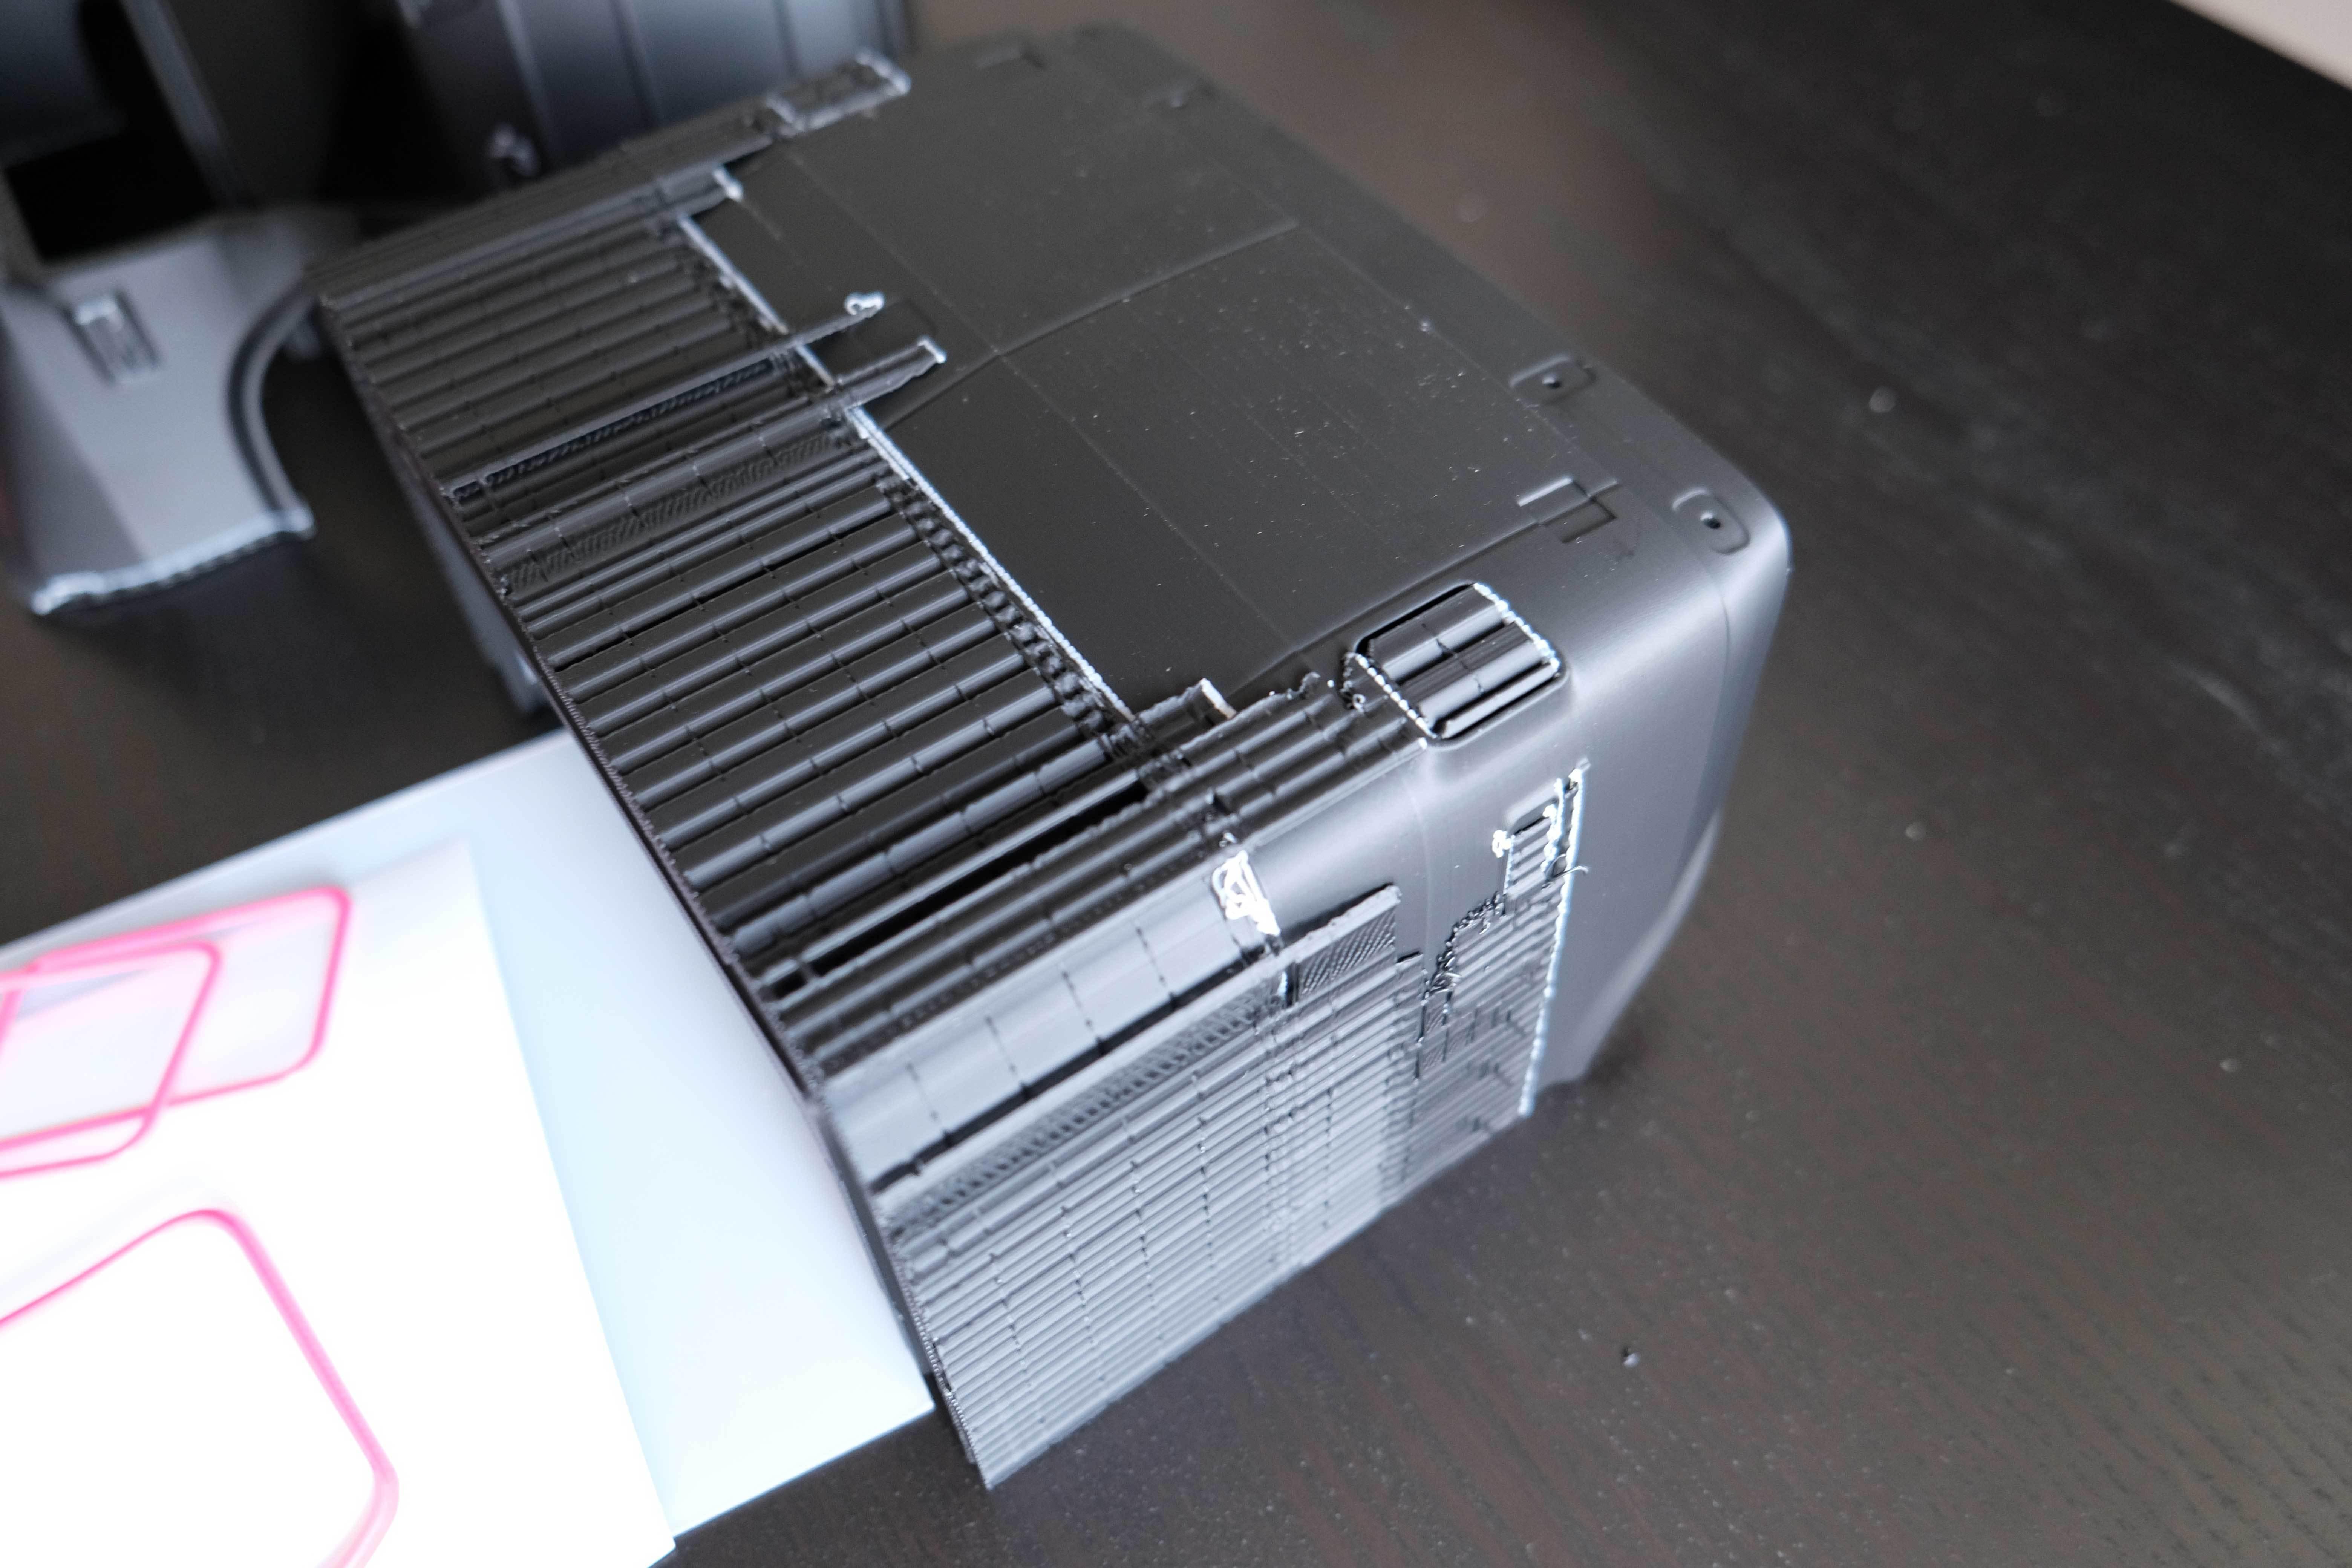 chevy-van-g20-3d-printed-2.jpg Descargar archivo STL CHEVY VAN G20 RC BODY SCALER AXIAL MST TRX4 RC4WD • Modelo para imprimir en 3D, ilyakapitonov